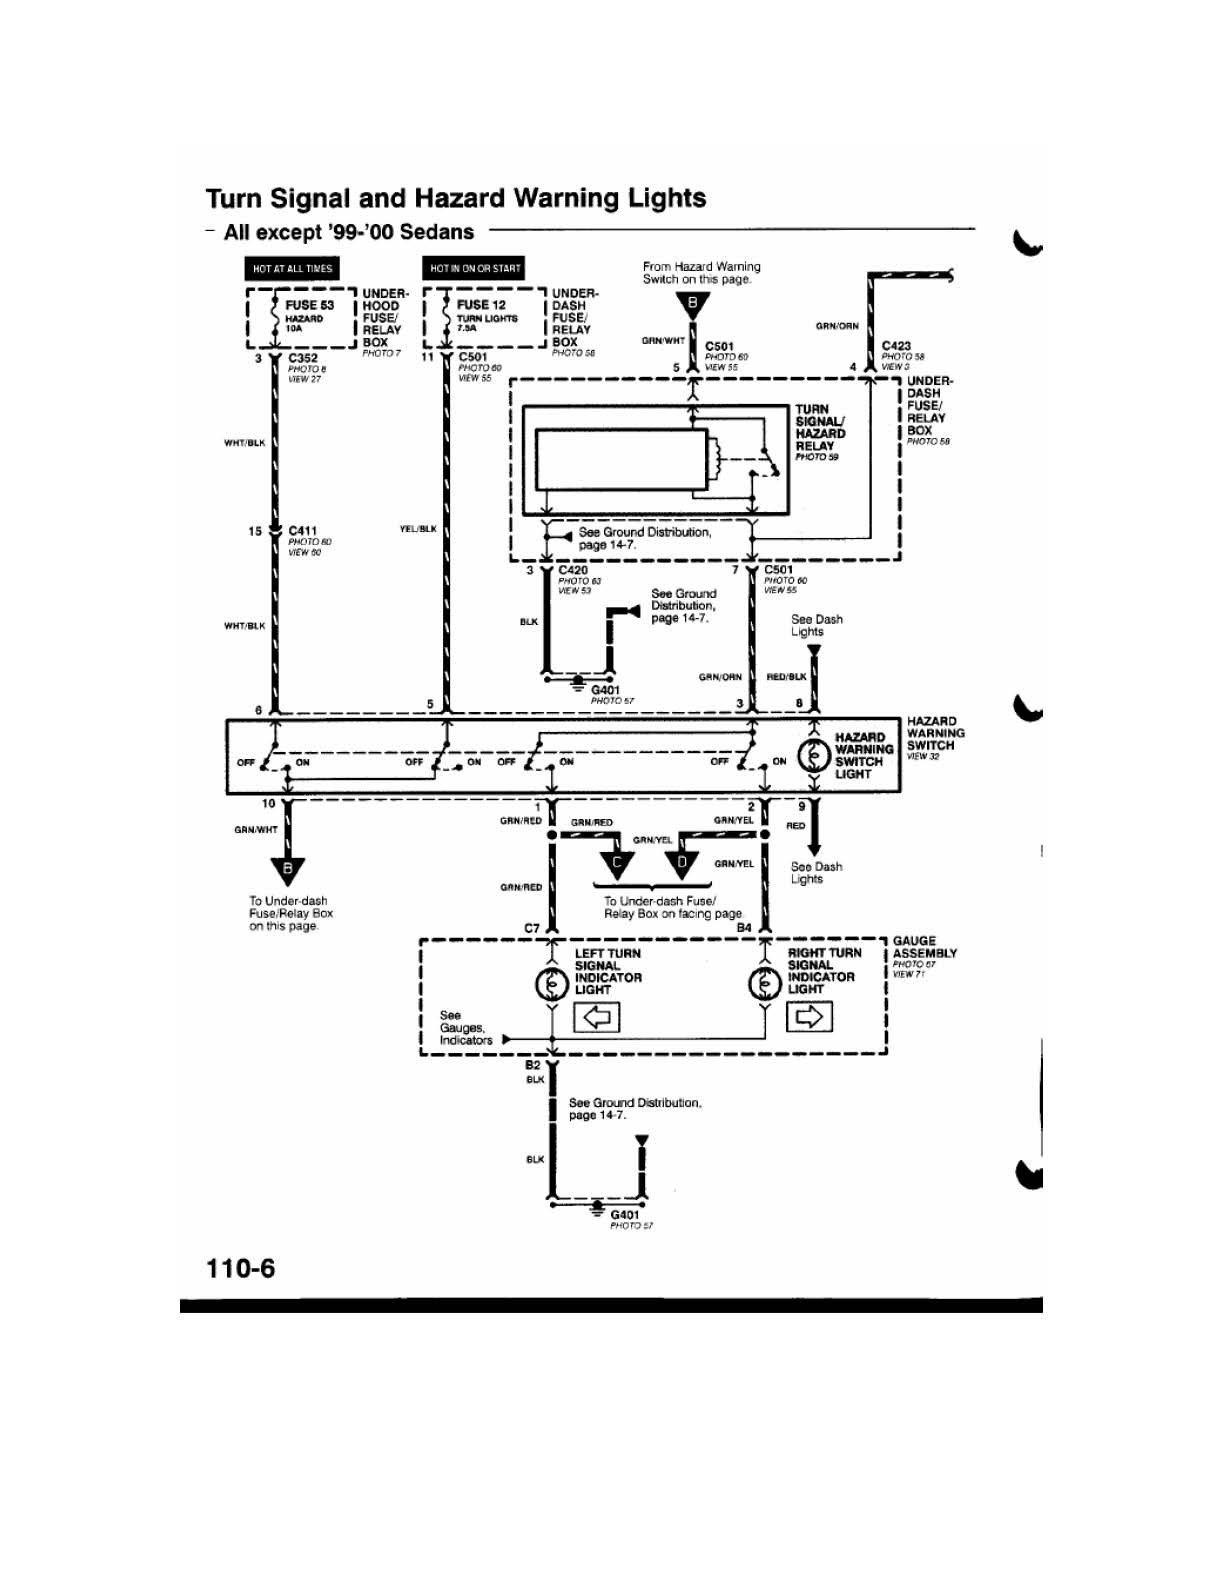 Led Turn Signal Wire Diagram 7 | Wiring Diagram - Badlands Turn Signal Module Wiring Diagram